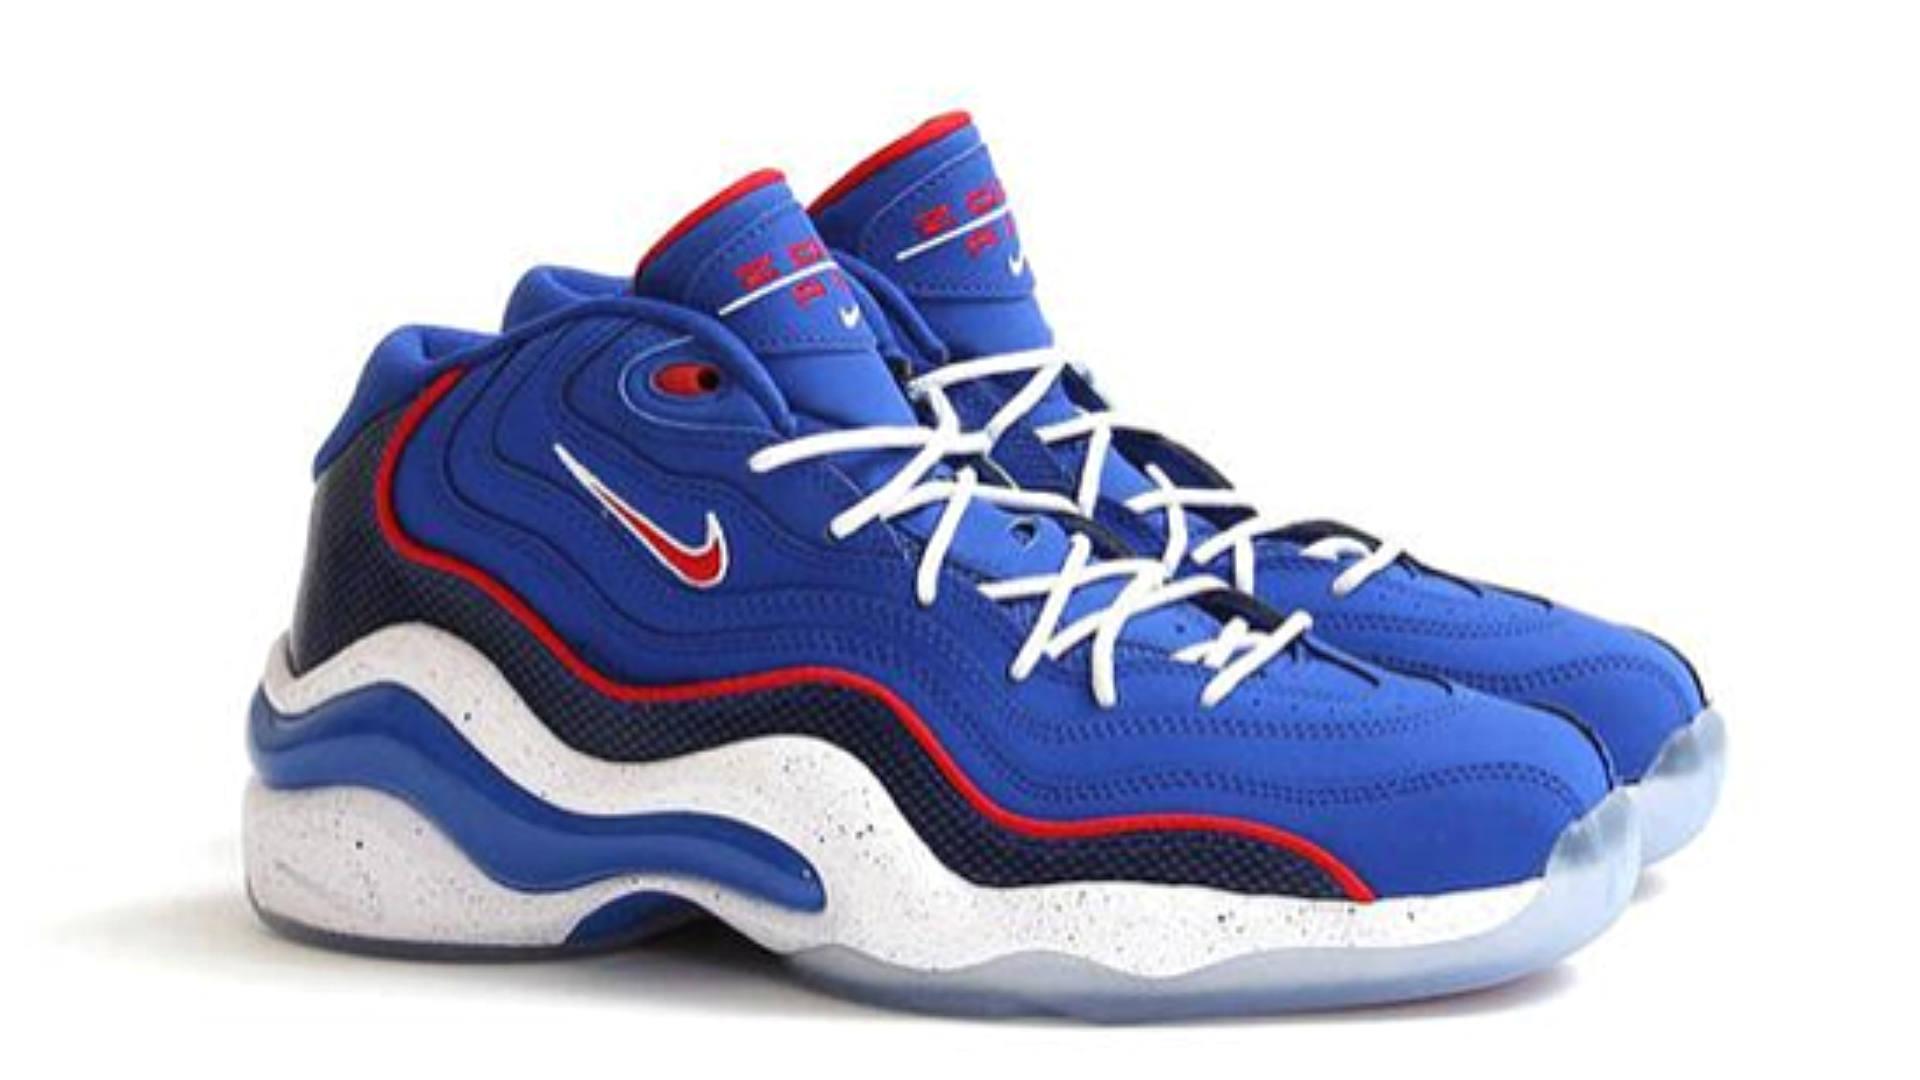 Nike nixes tribute shoe plan after Allen Iverson protest